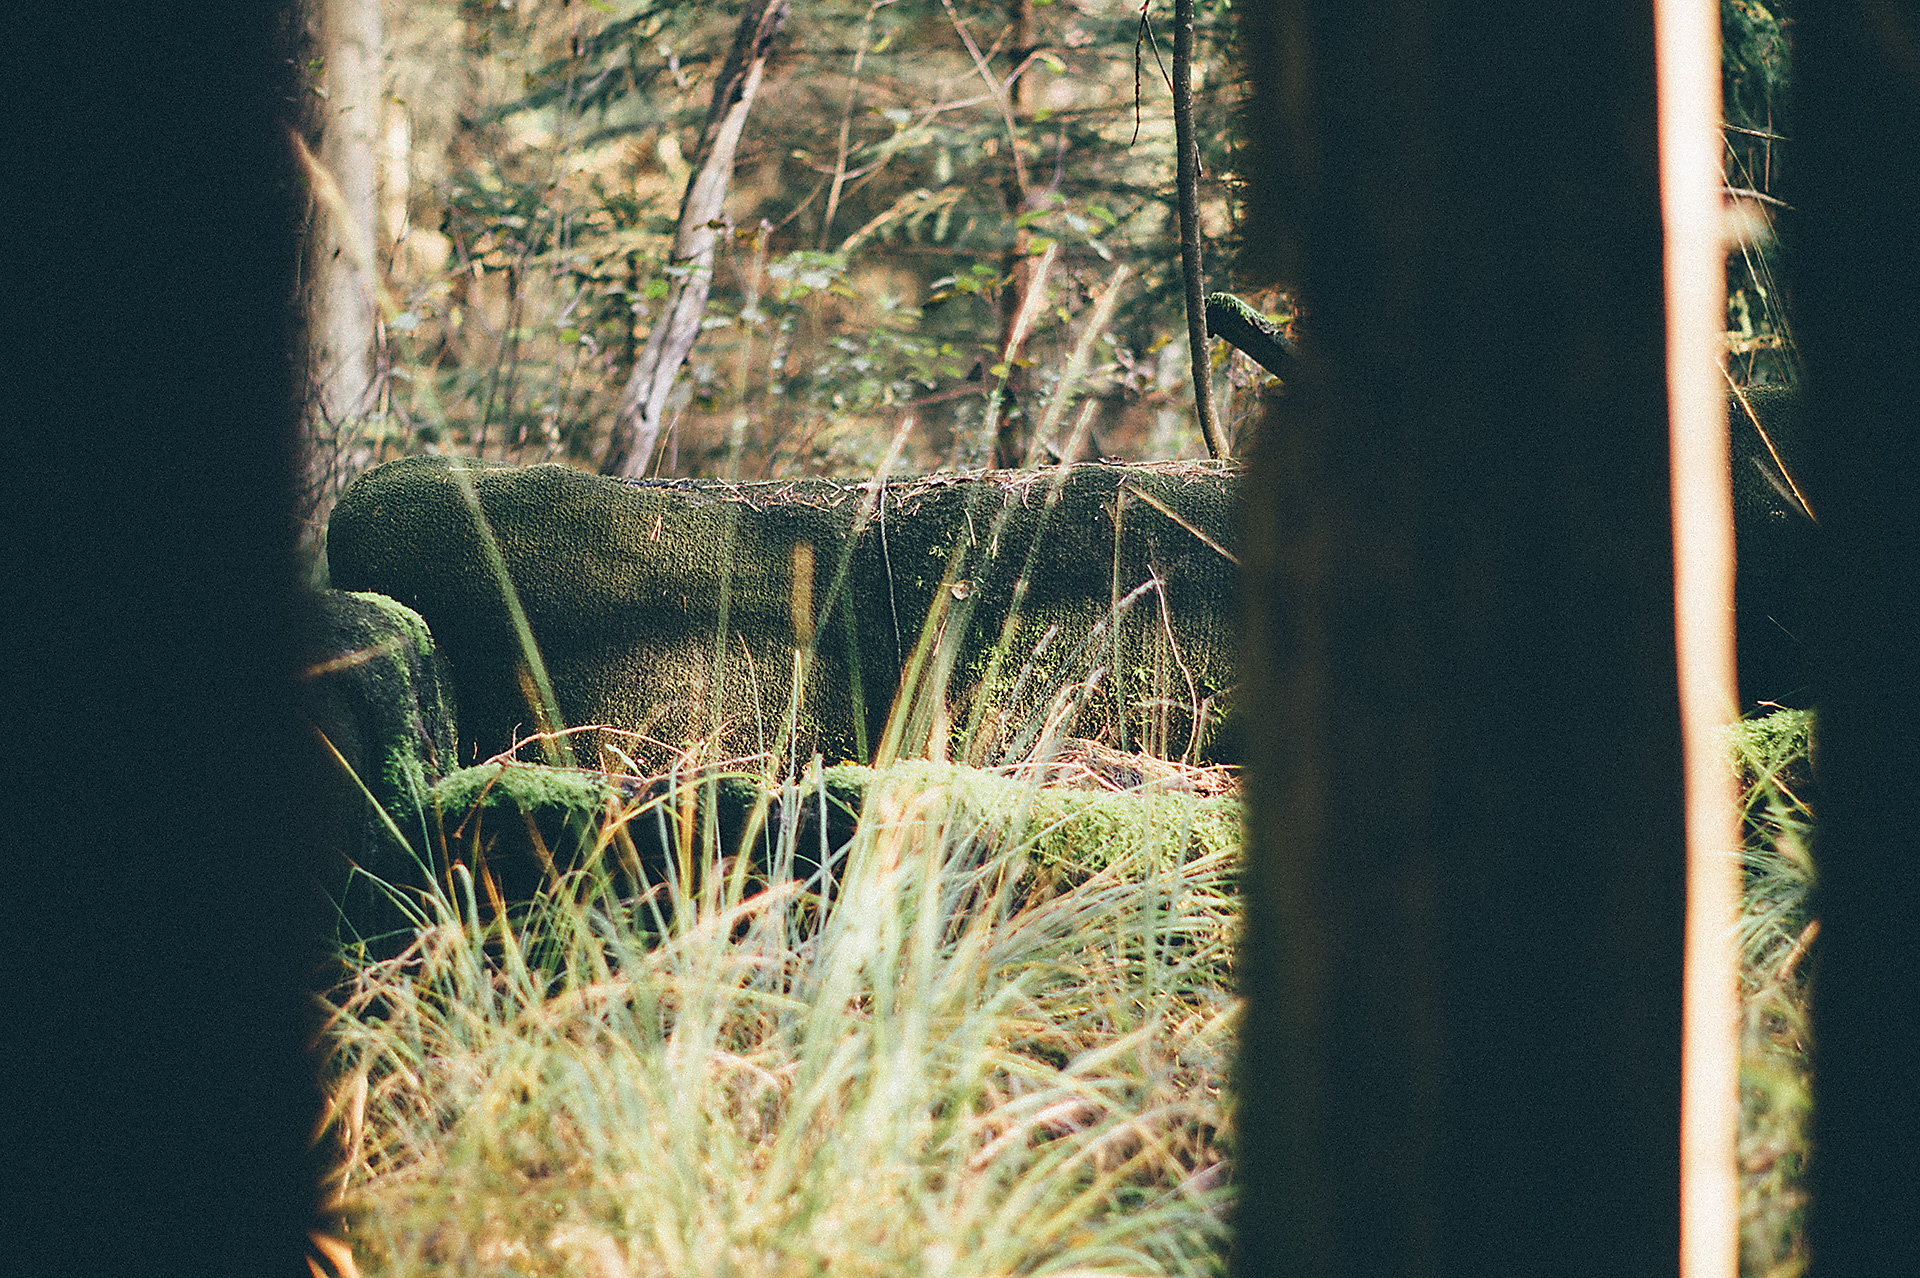 ver·gẹs·sen | Fotoserie